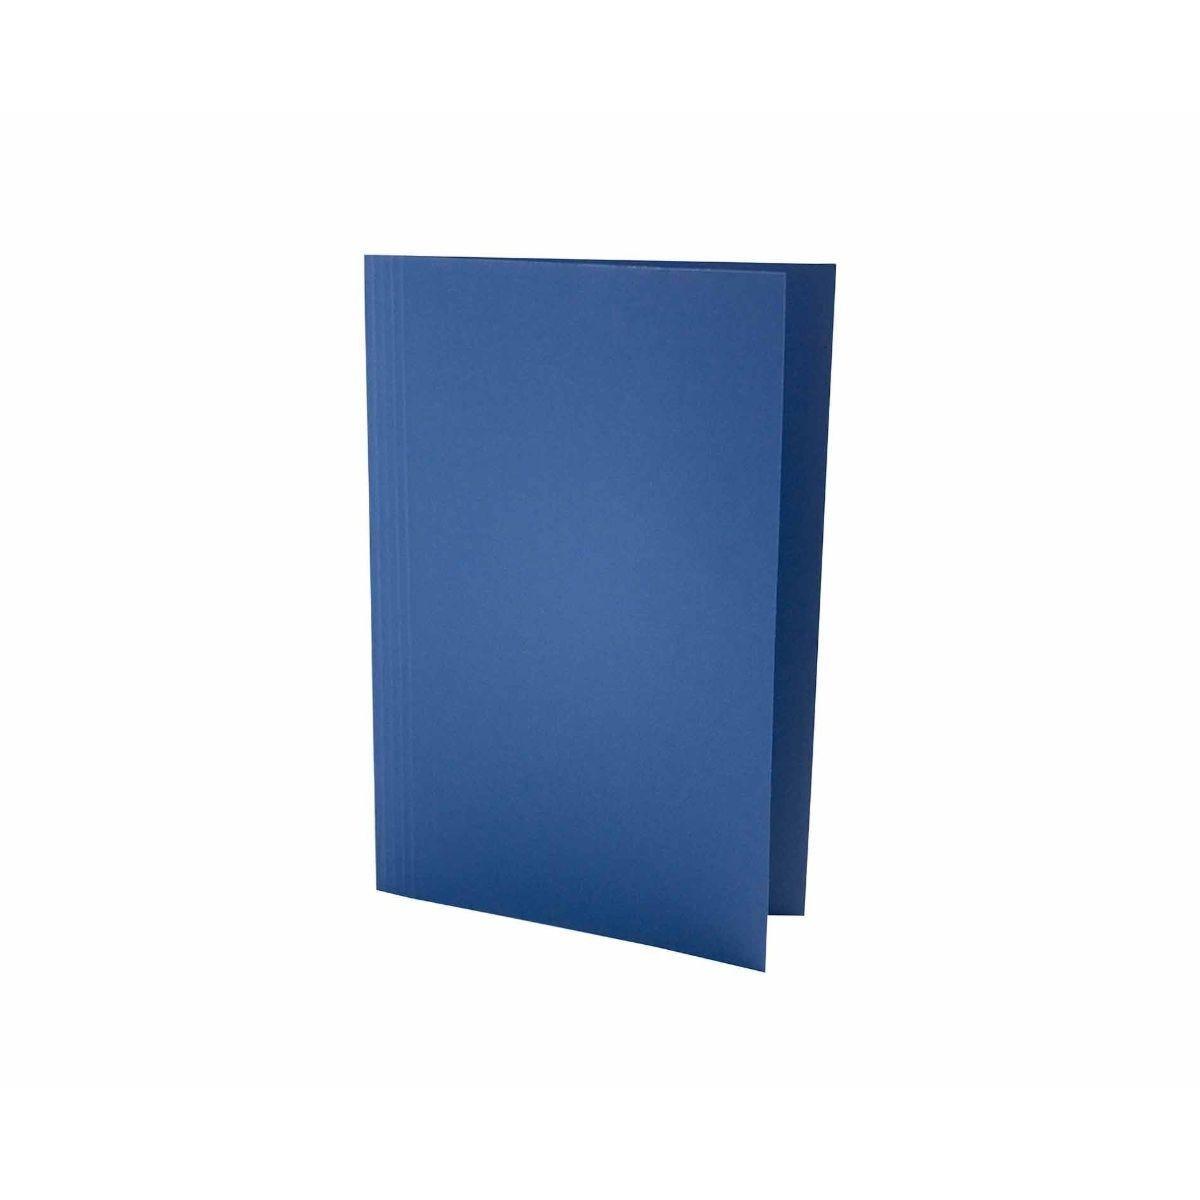 Exacompta Foolscap Folder Pack of 100 180gsm